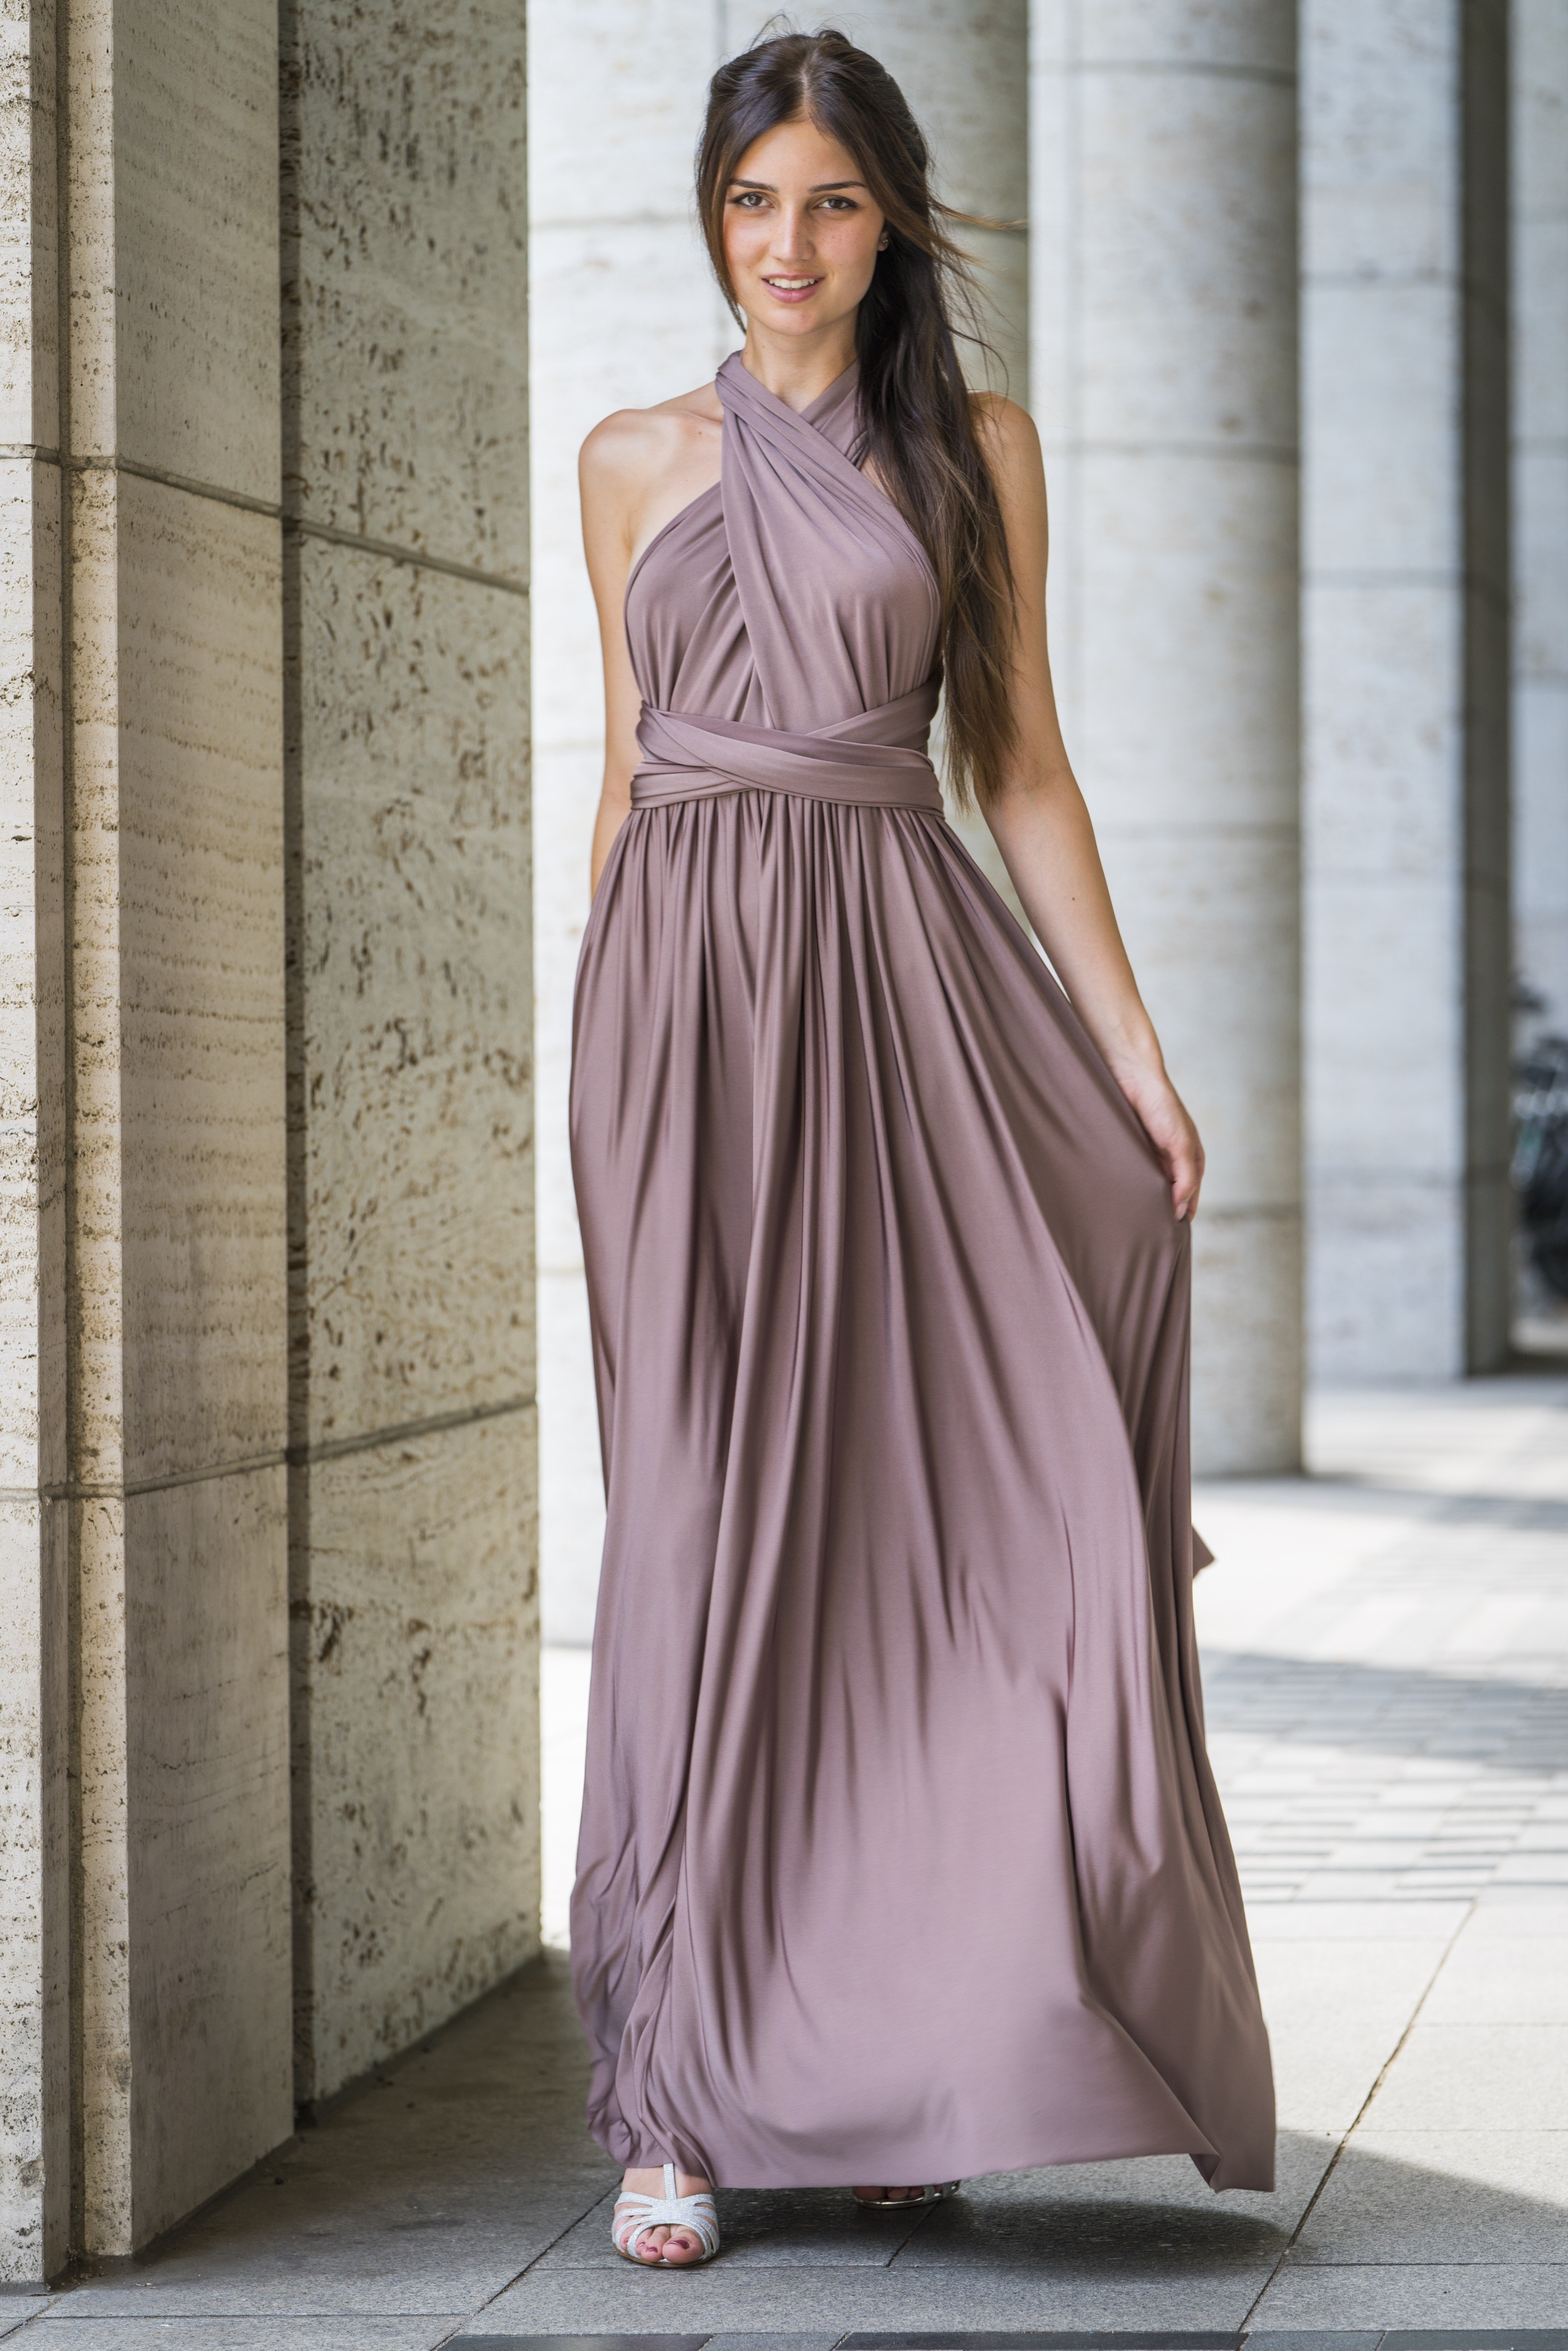 20 Kreativ Wickelkleid Abendkleid Boutique17 Großartig Wickelkleid Abendkleid Spezialgebiet